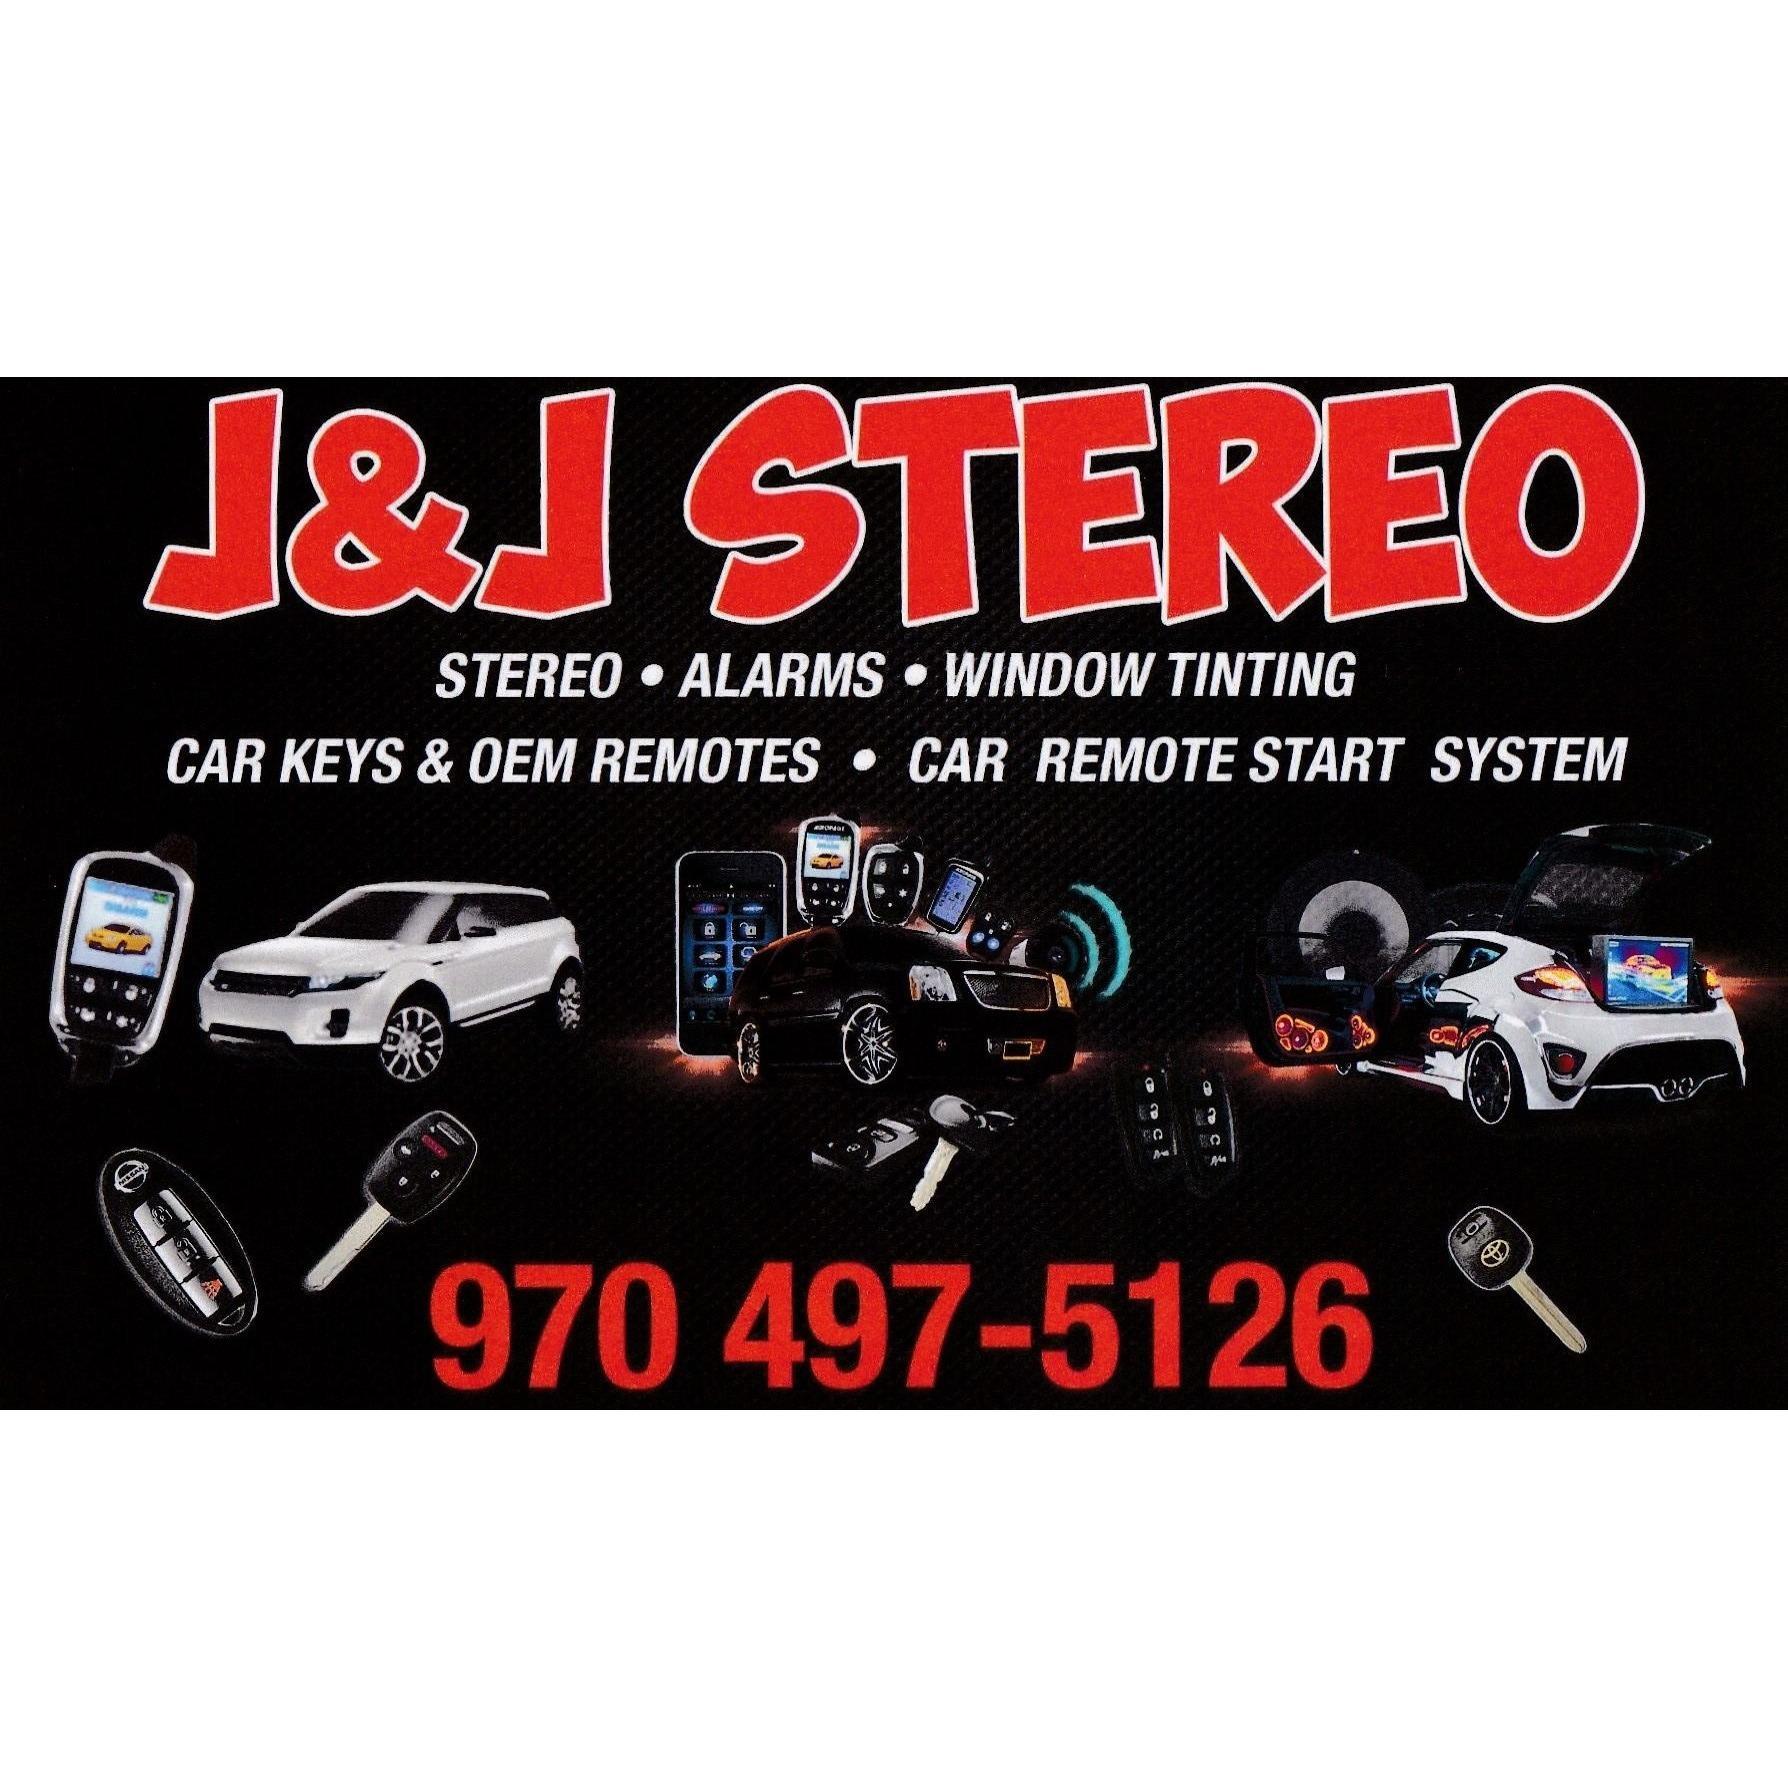 J&J STEREO image 4